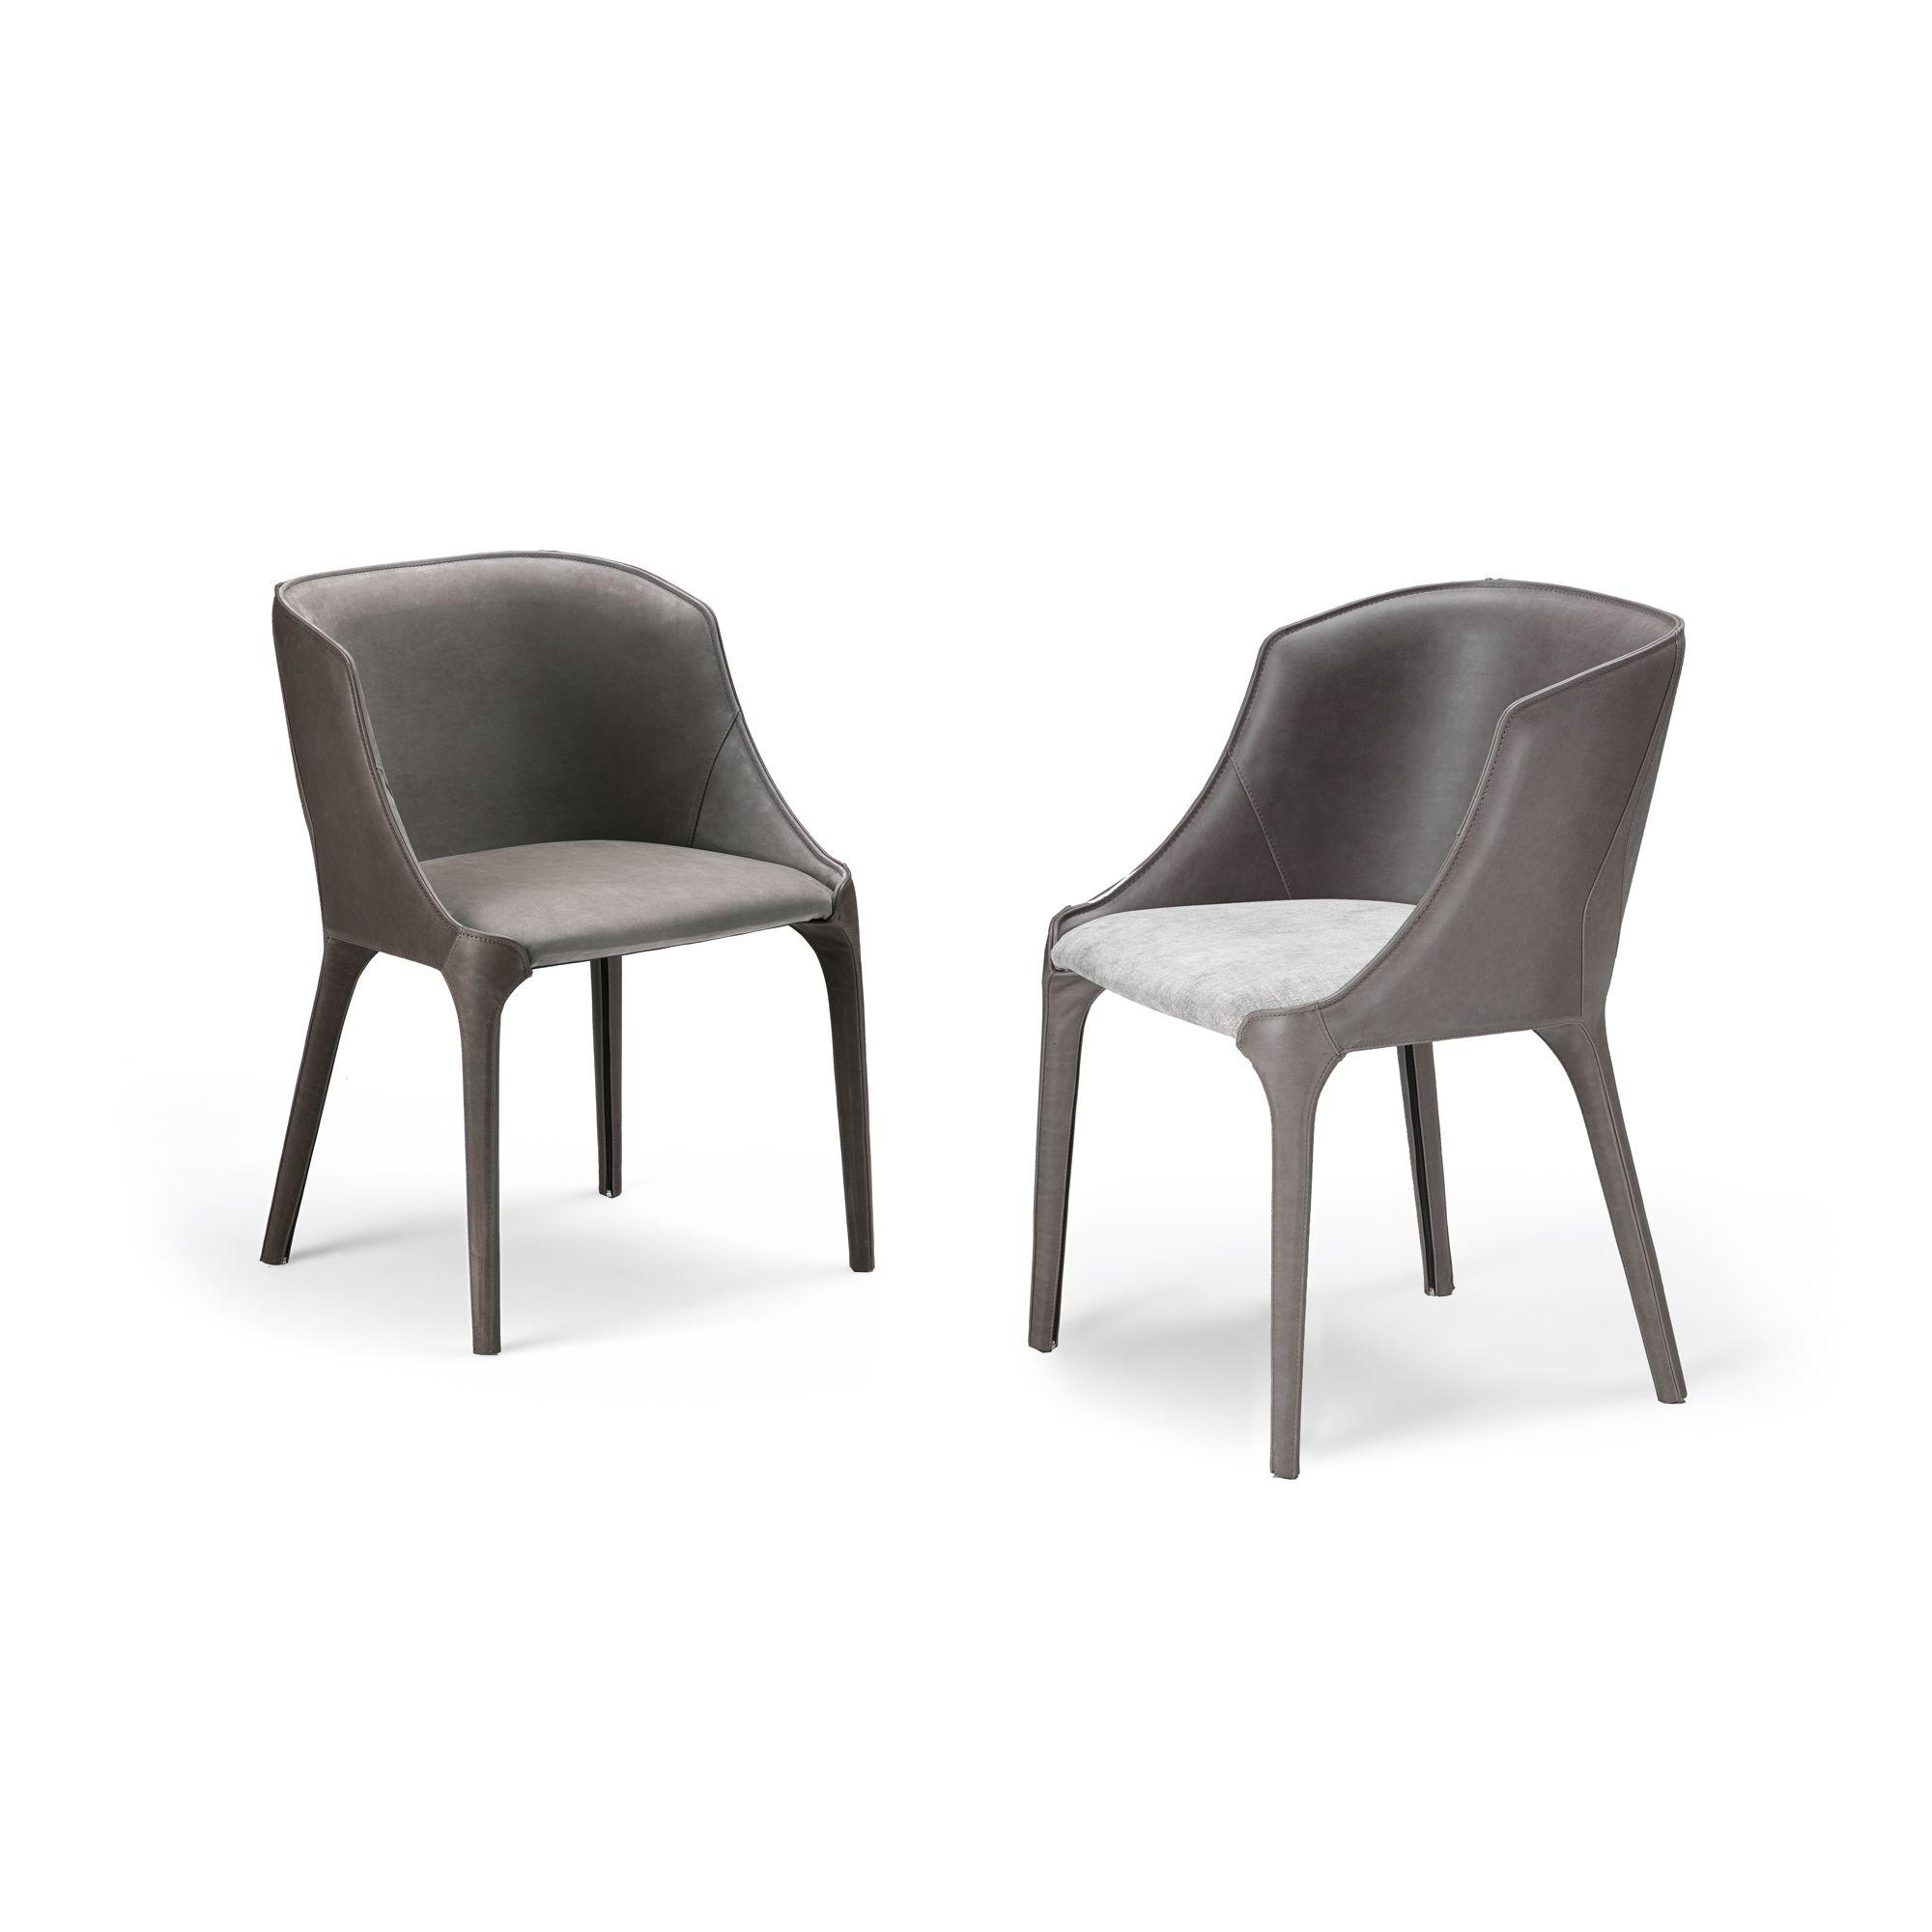 Luxury Italian Designer Goldie Chair Italian Designer Luxury Furniture At Cassoni Contemporary Dining Room Design Upholstered Chairs Furniture